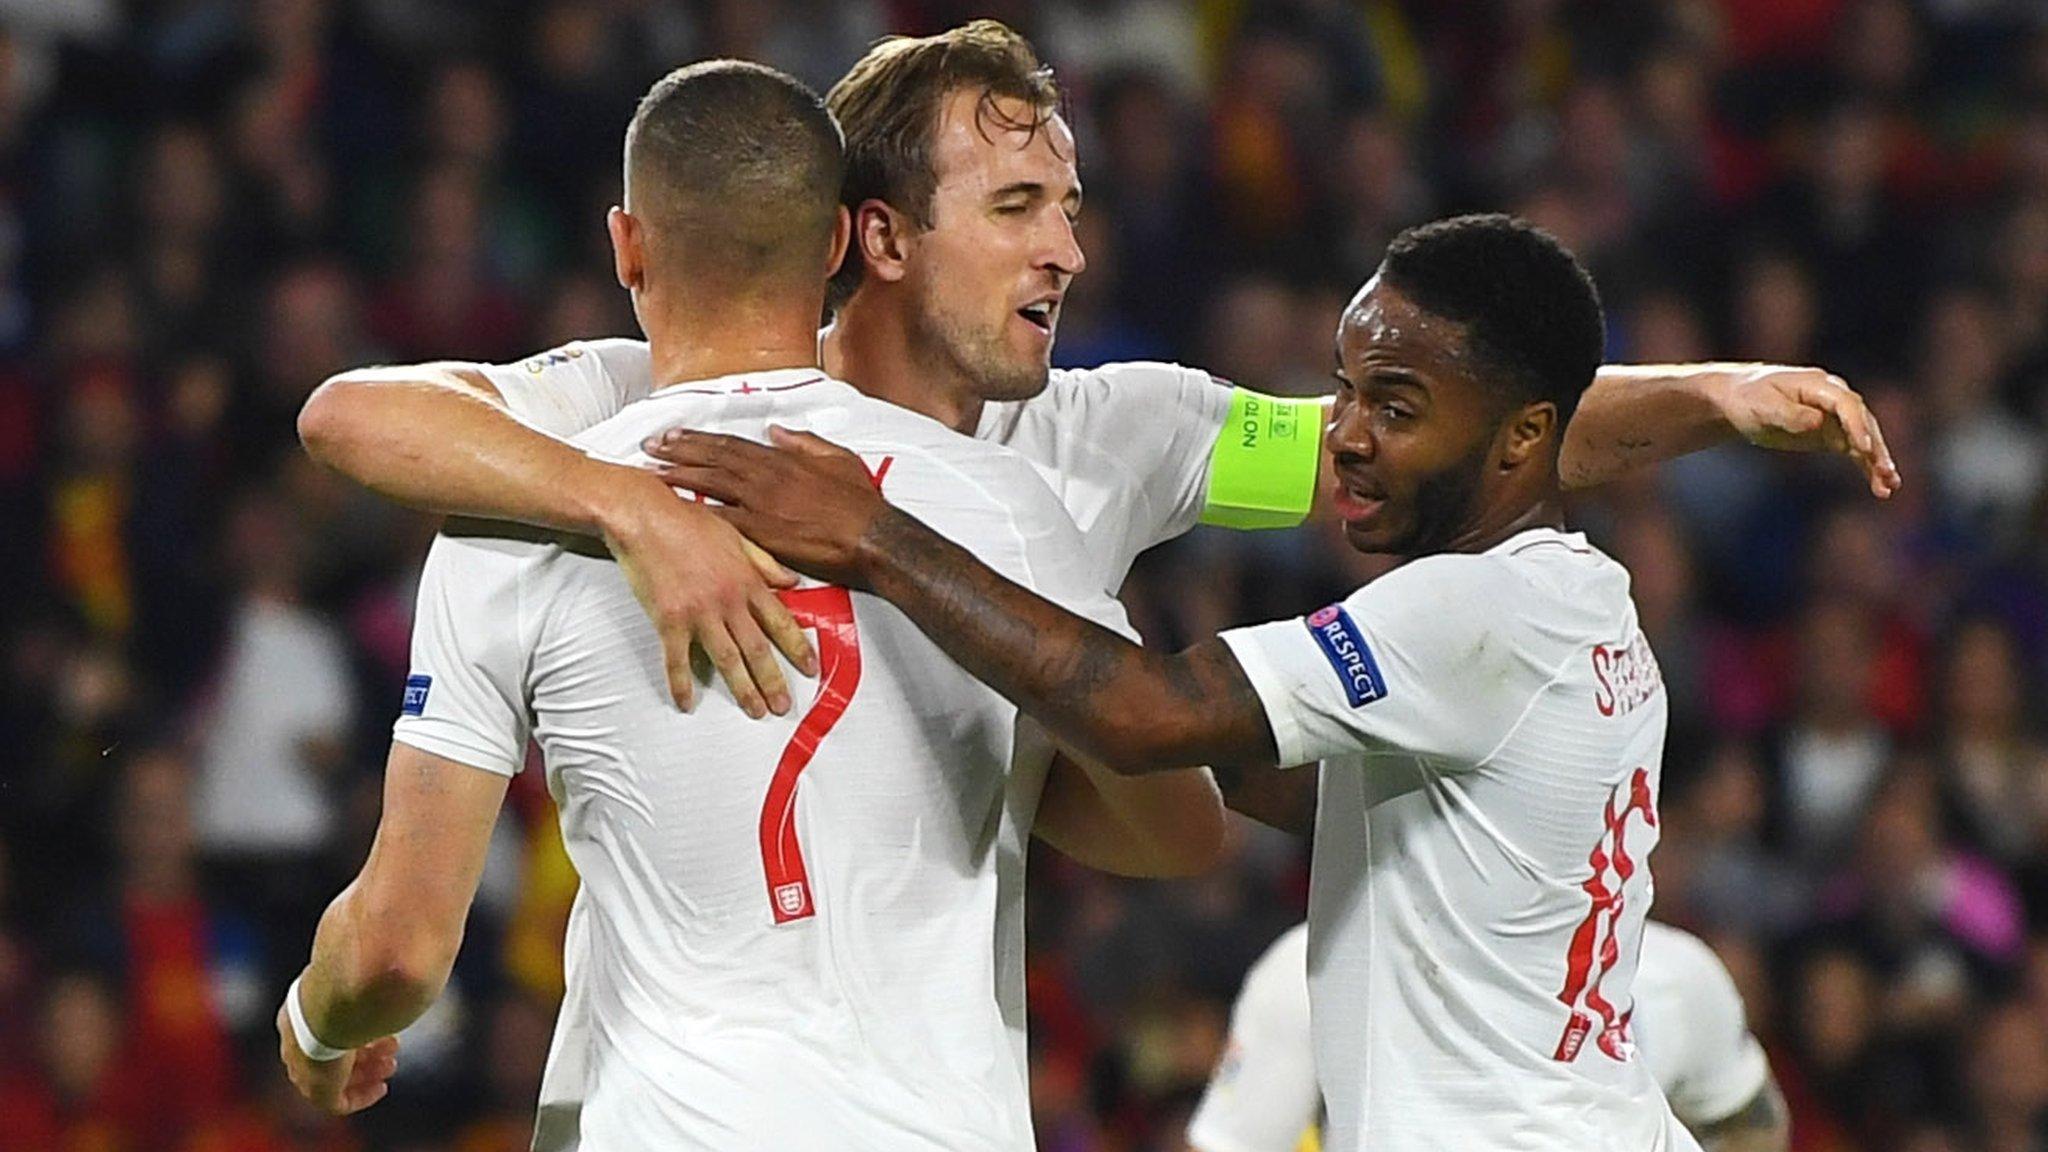 Spain 2-3 England: Raheem Sterling goals inspire stunning victory